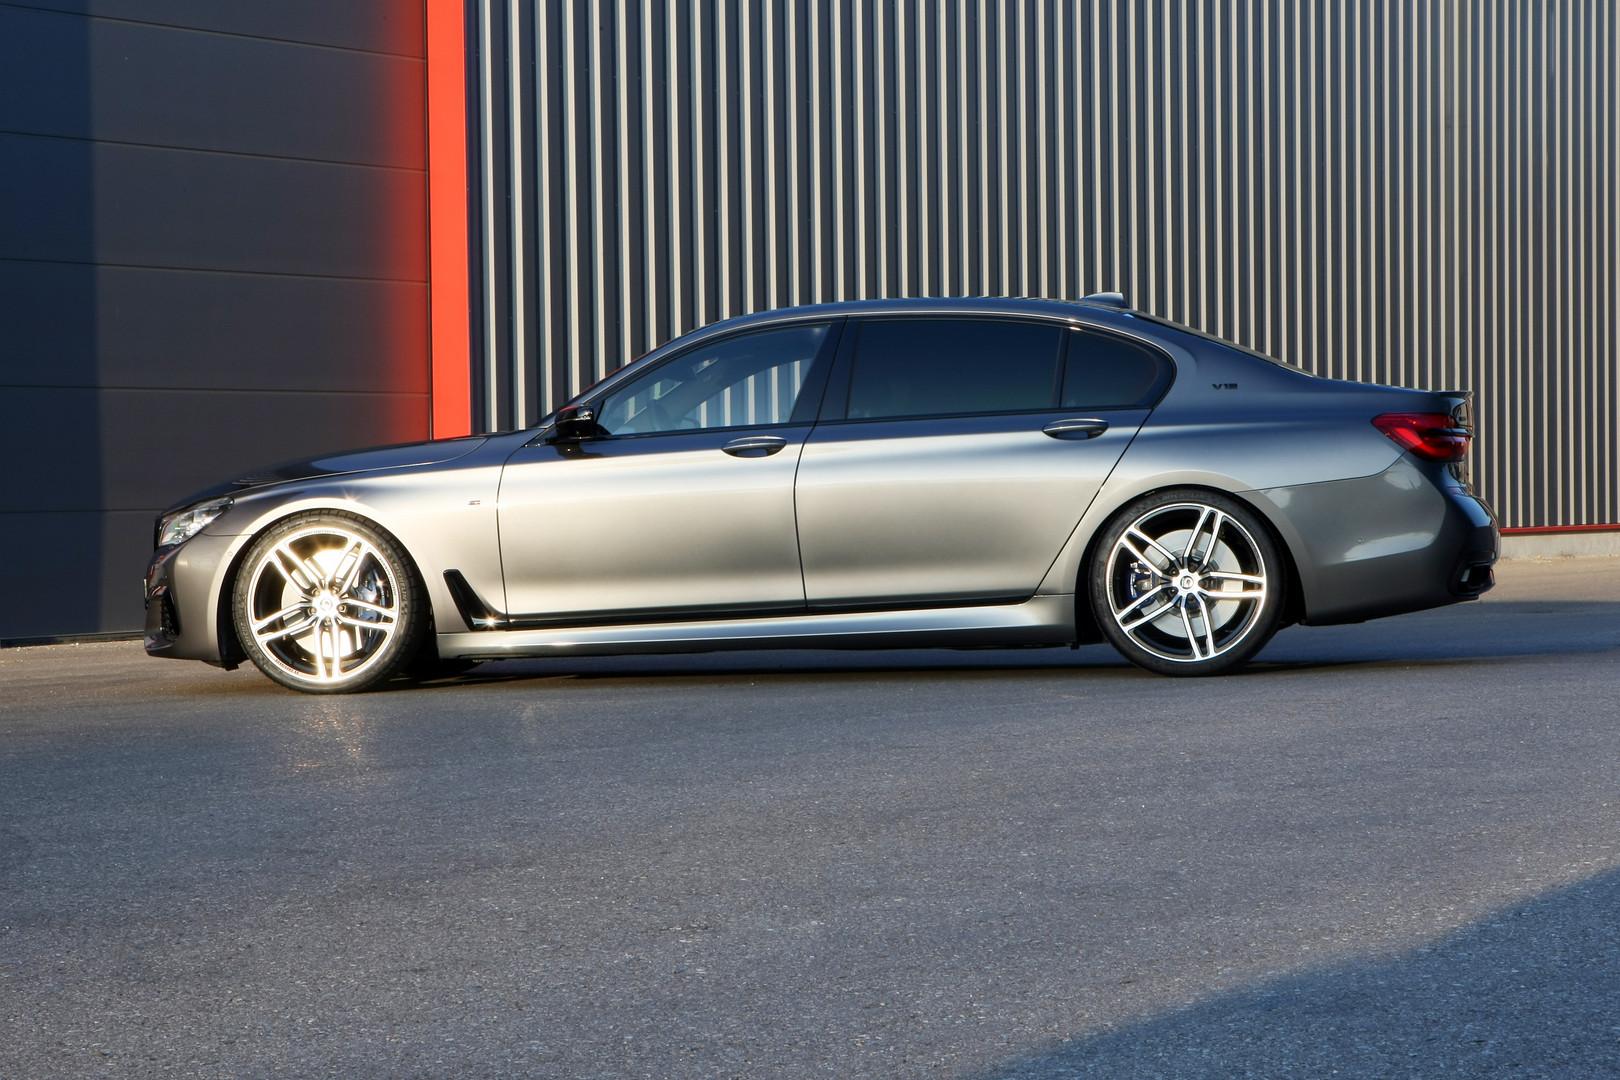 700 hp BMW M760Li by G-Power